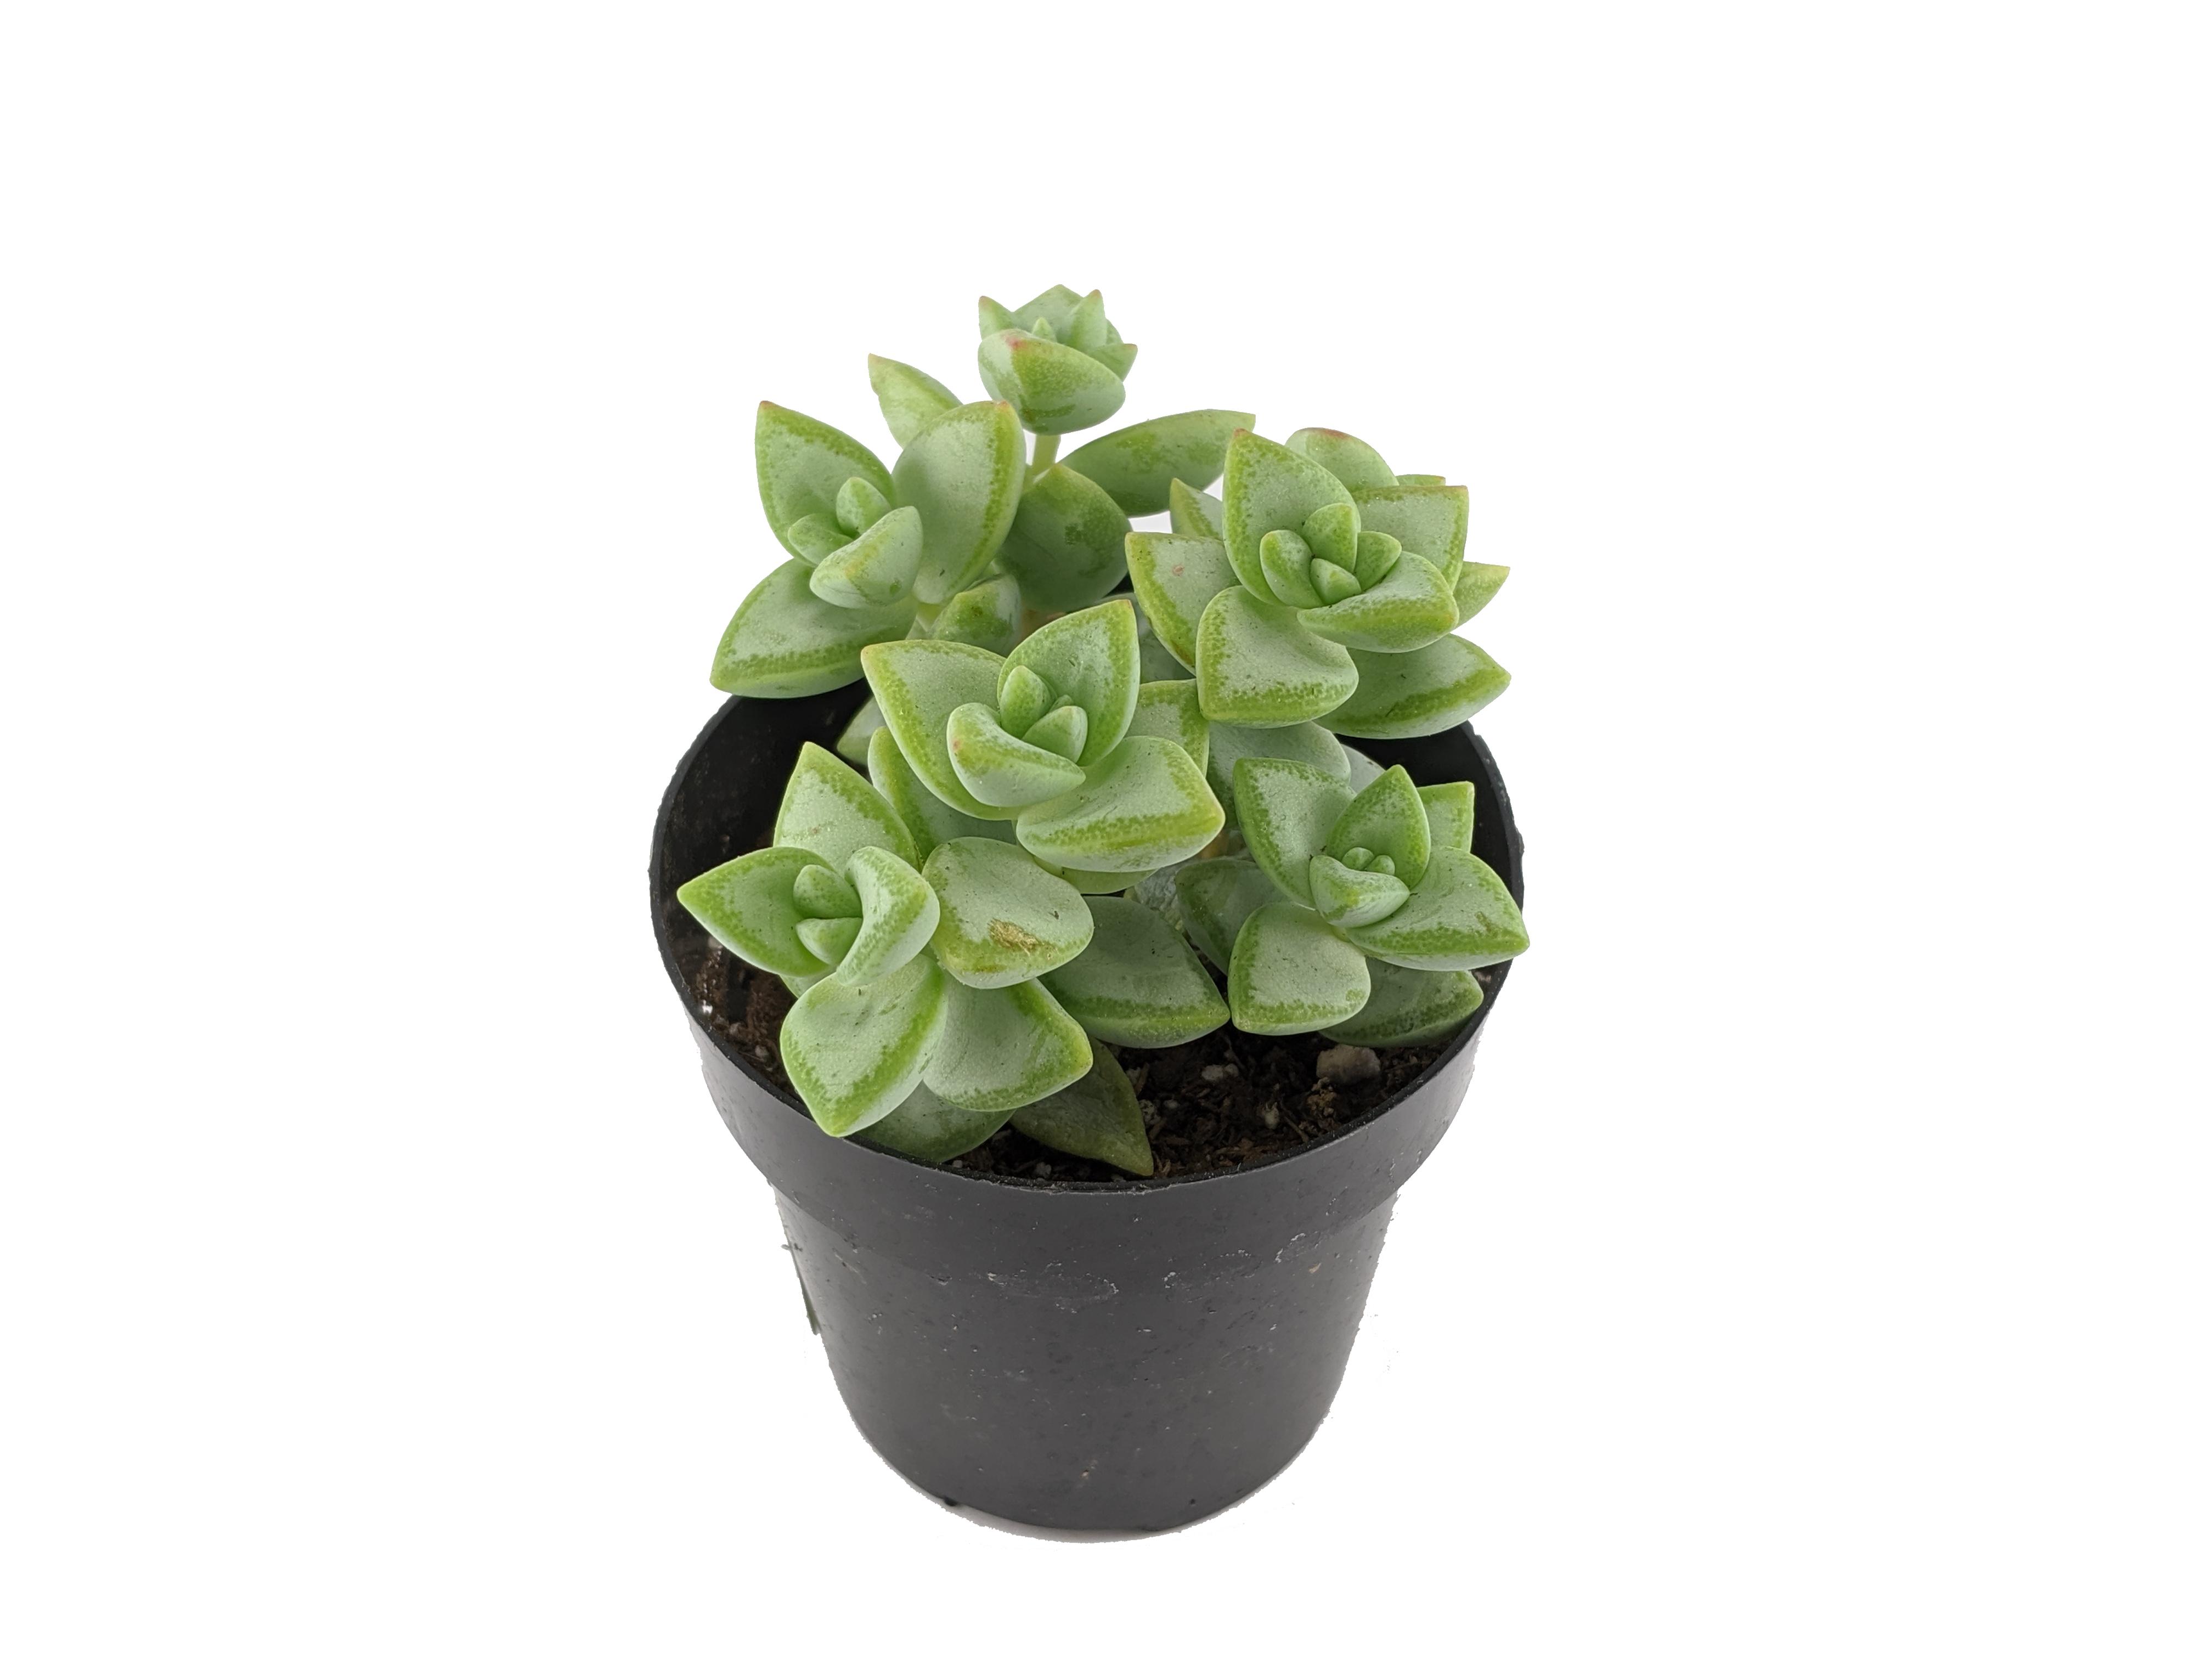 We have plants!